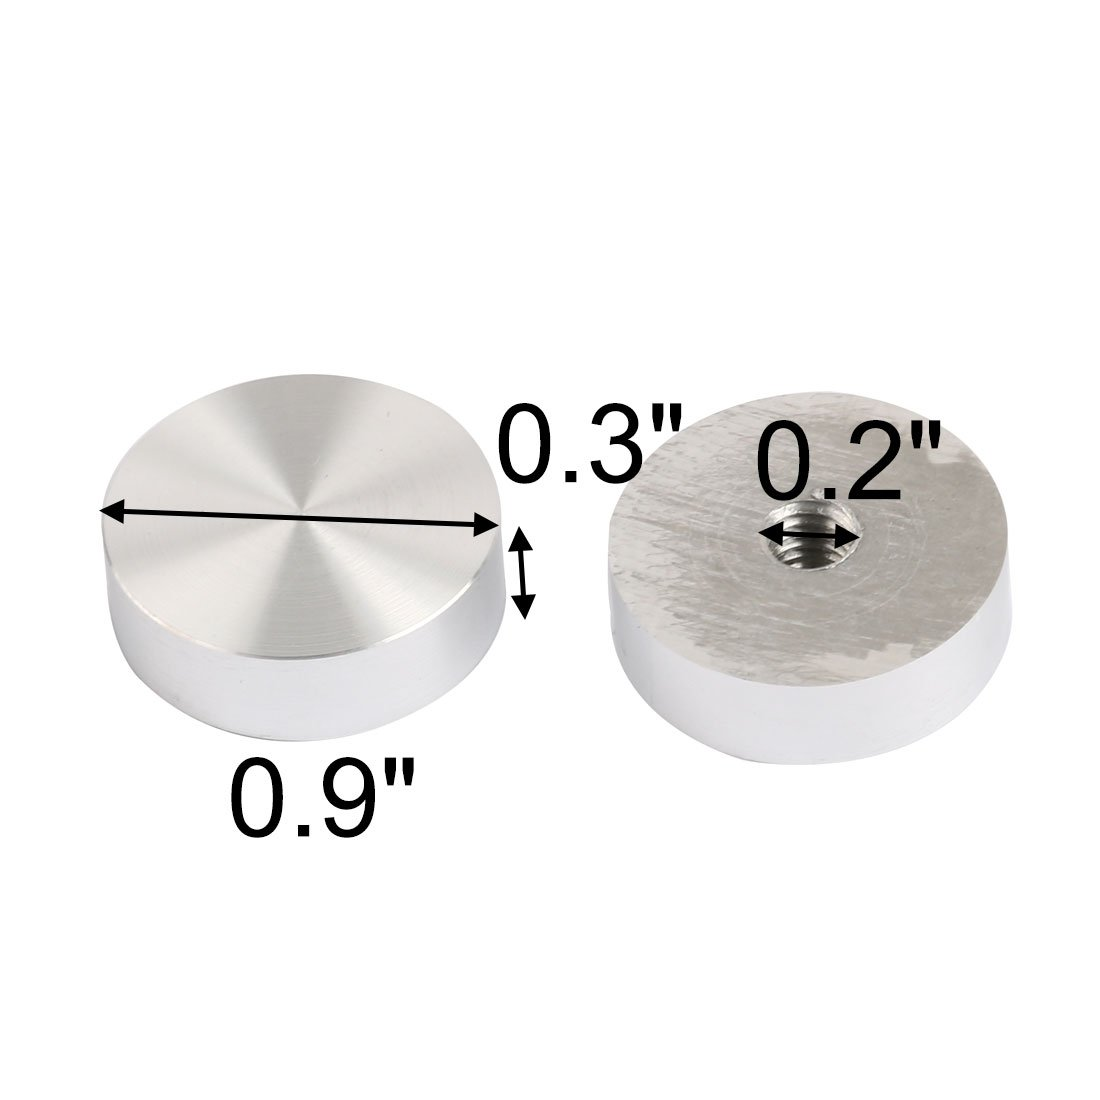 8pcs 24mm Durchm Silber Ton Büro Rund Tee Tabelle Aluminiumscheiben Adapter